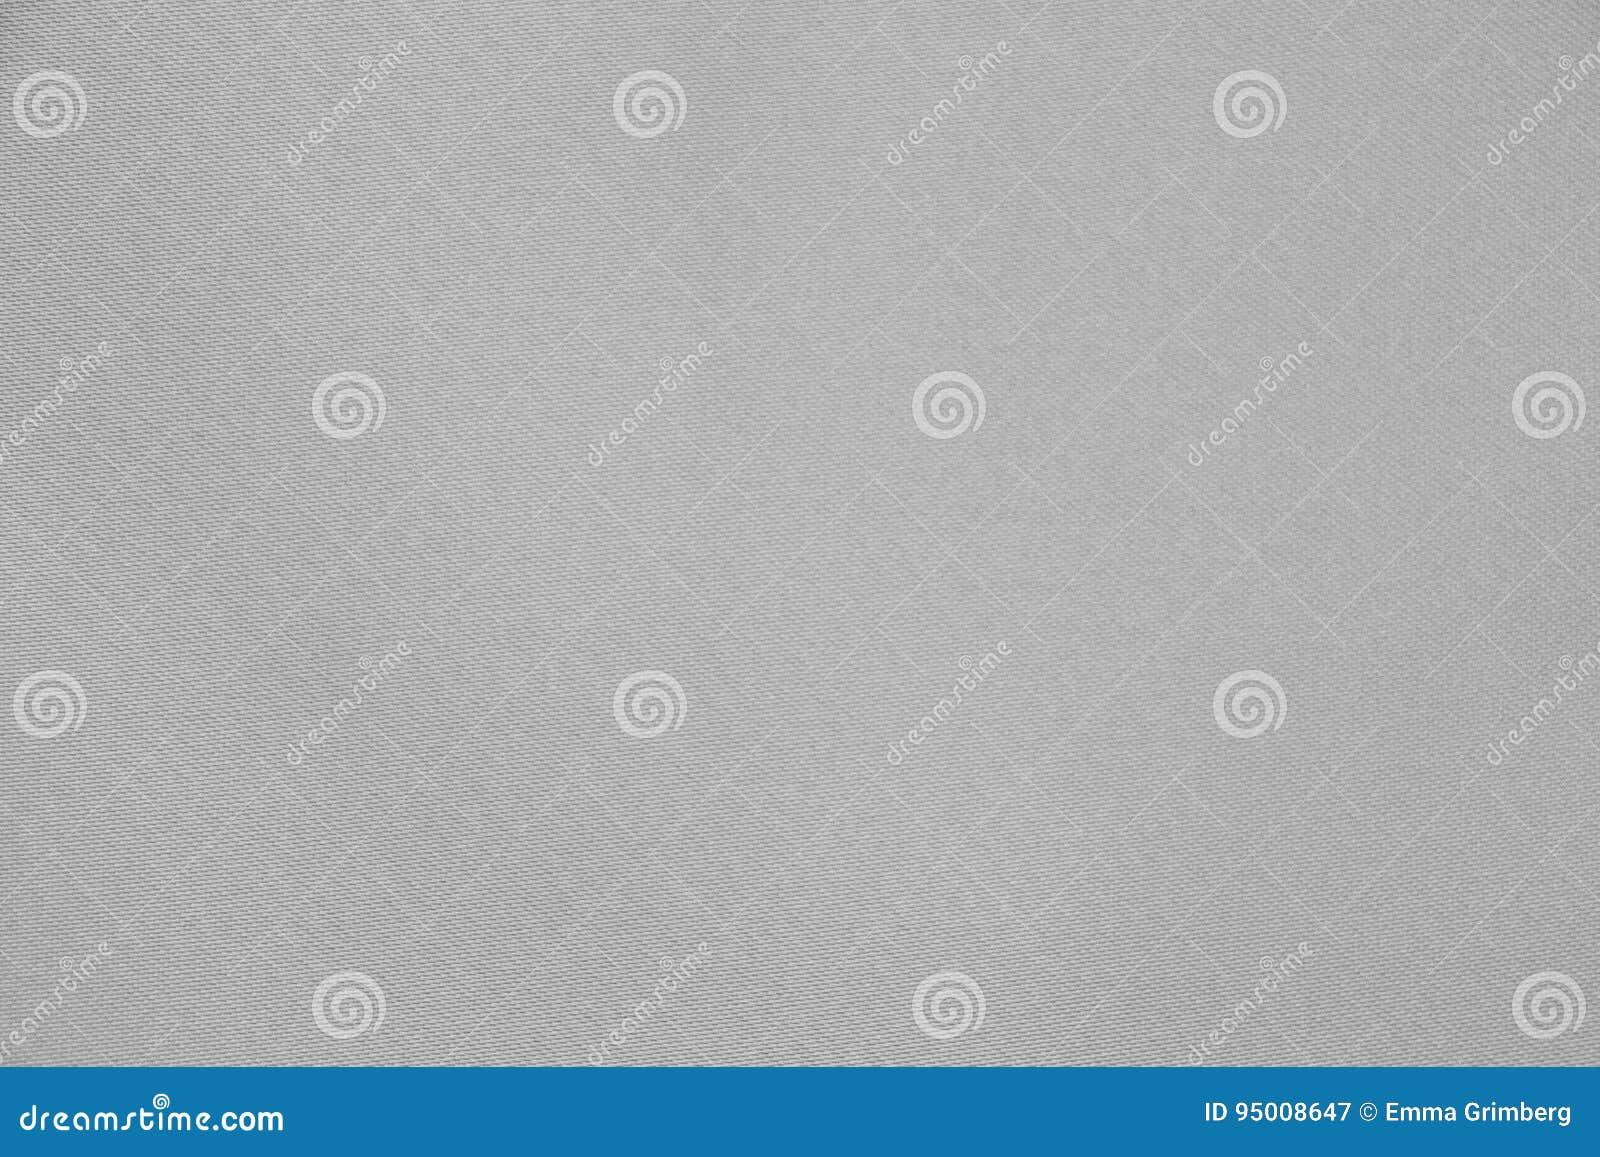 white textured fabric background stock image image of diagonal